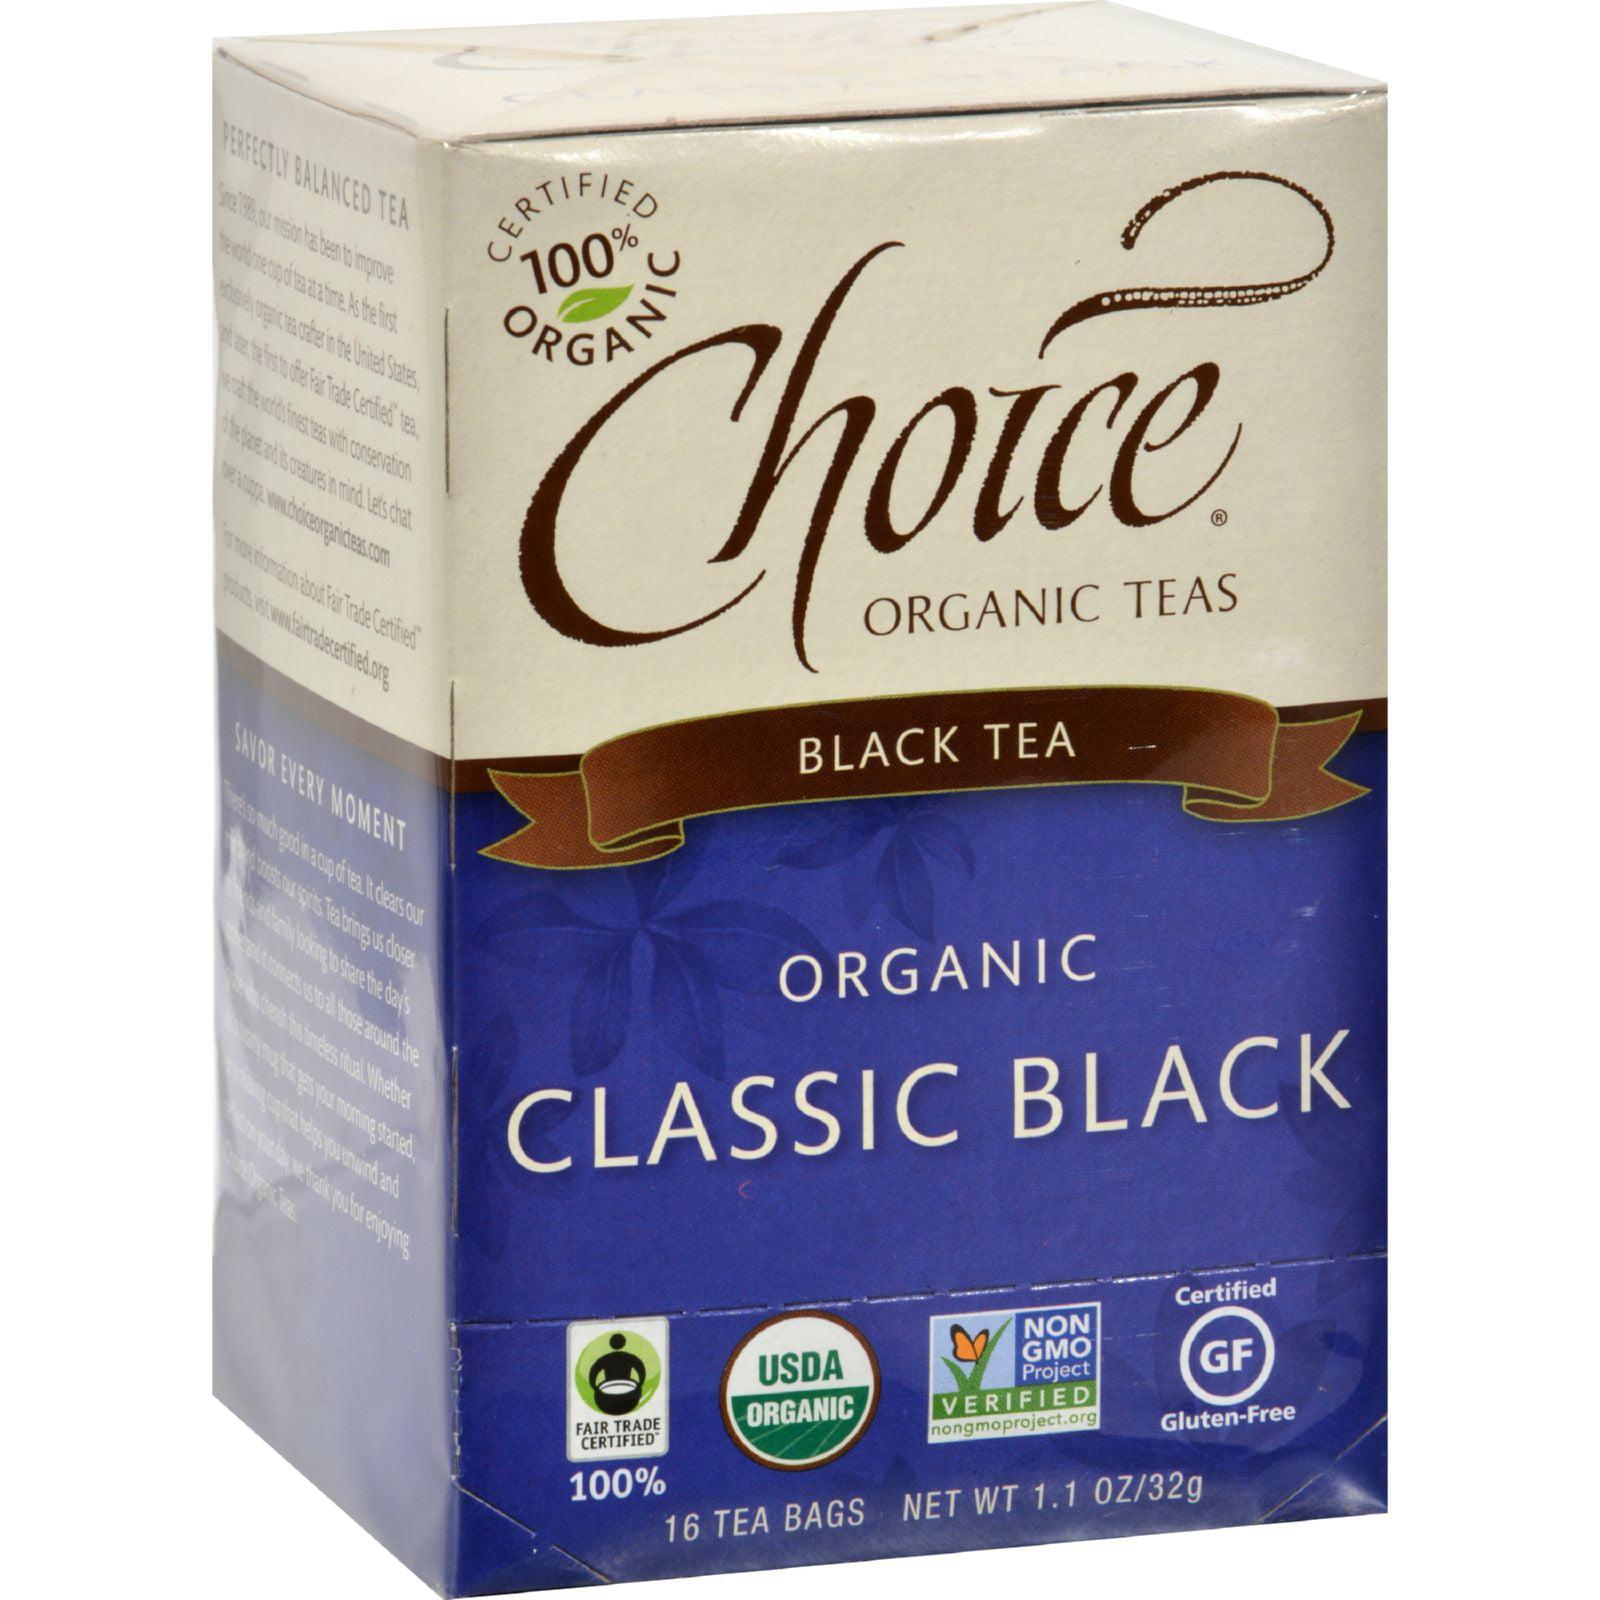 Choice Organic Teas Black Tea - 16 Tea Bags - Case of 6